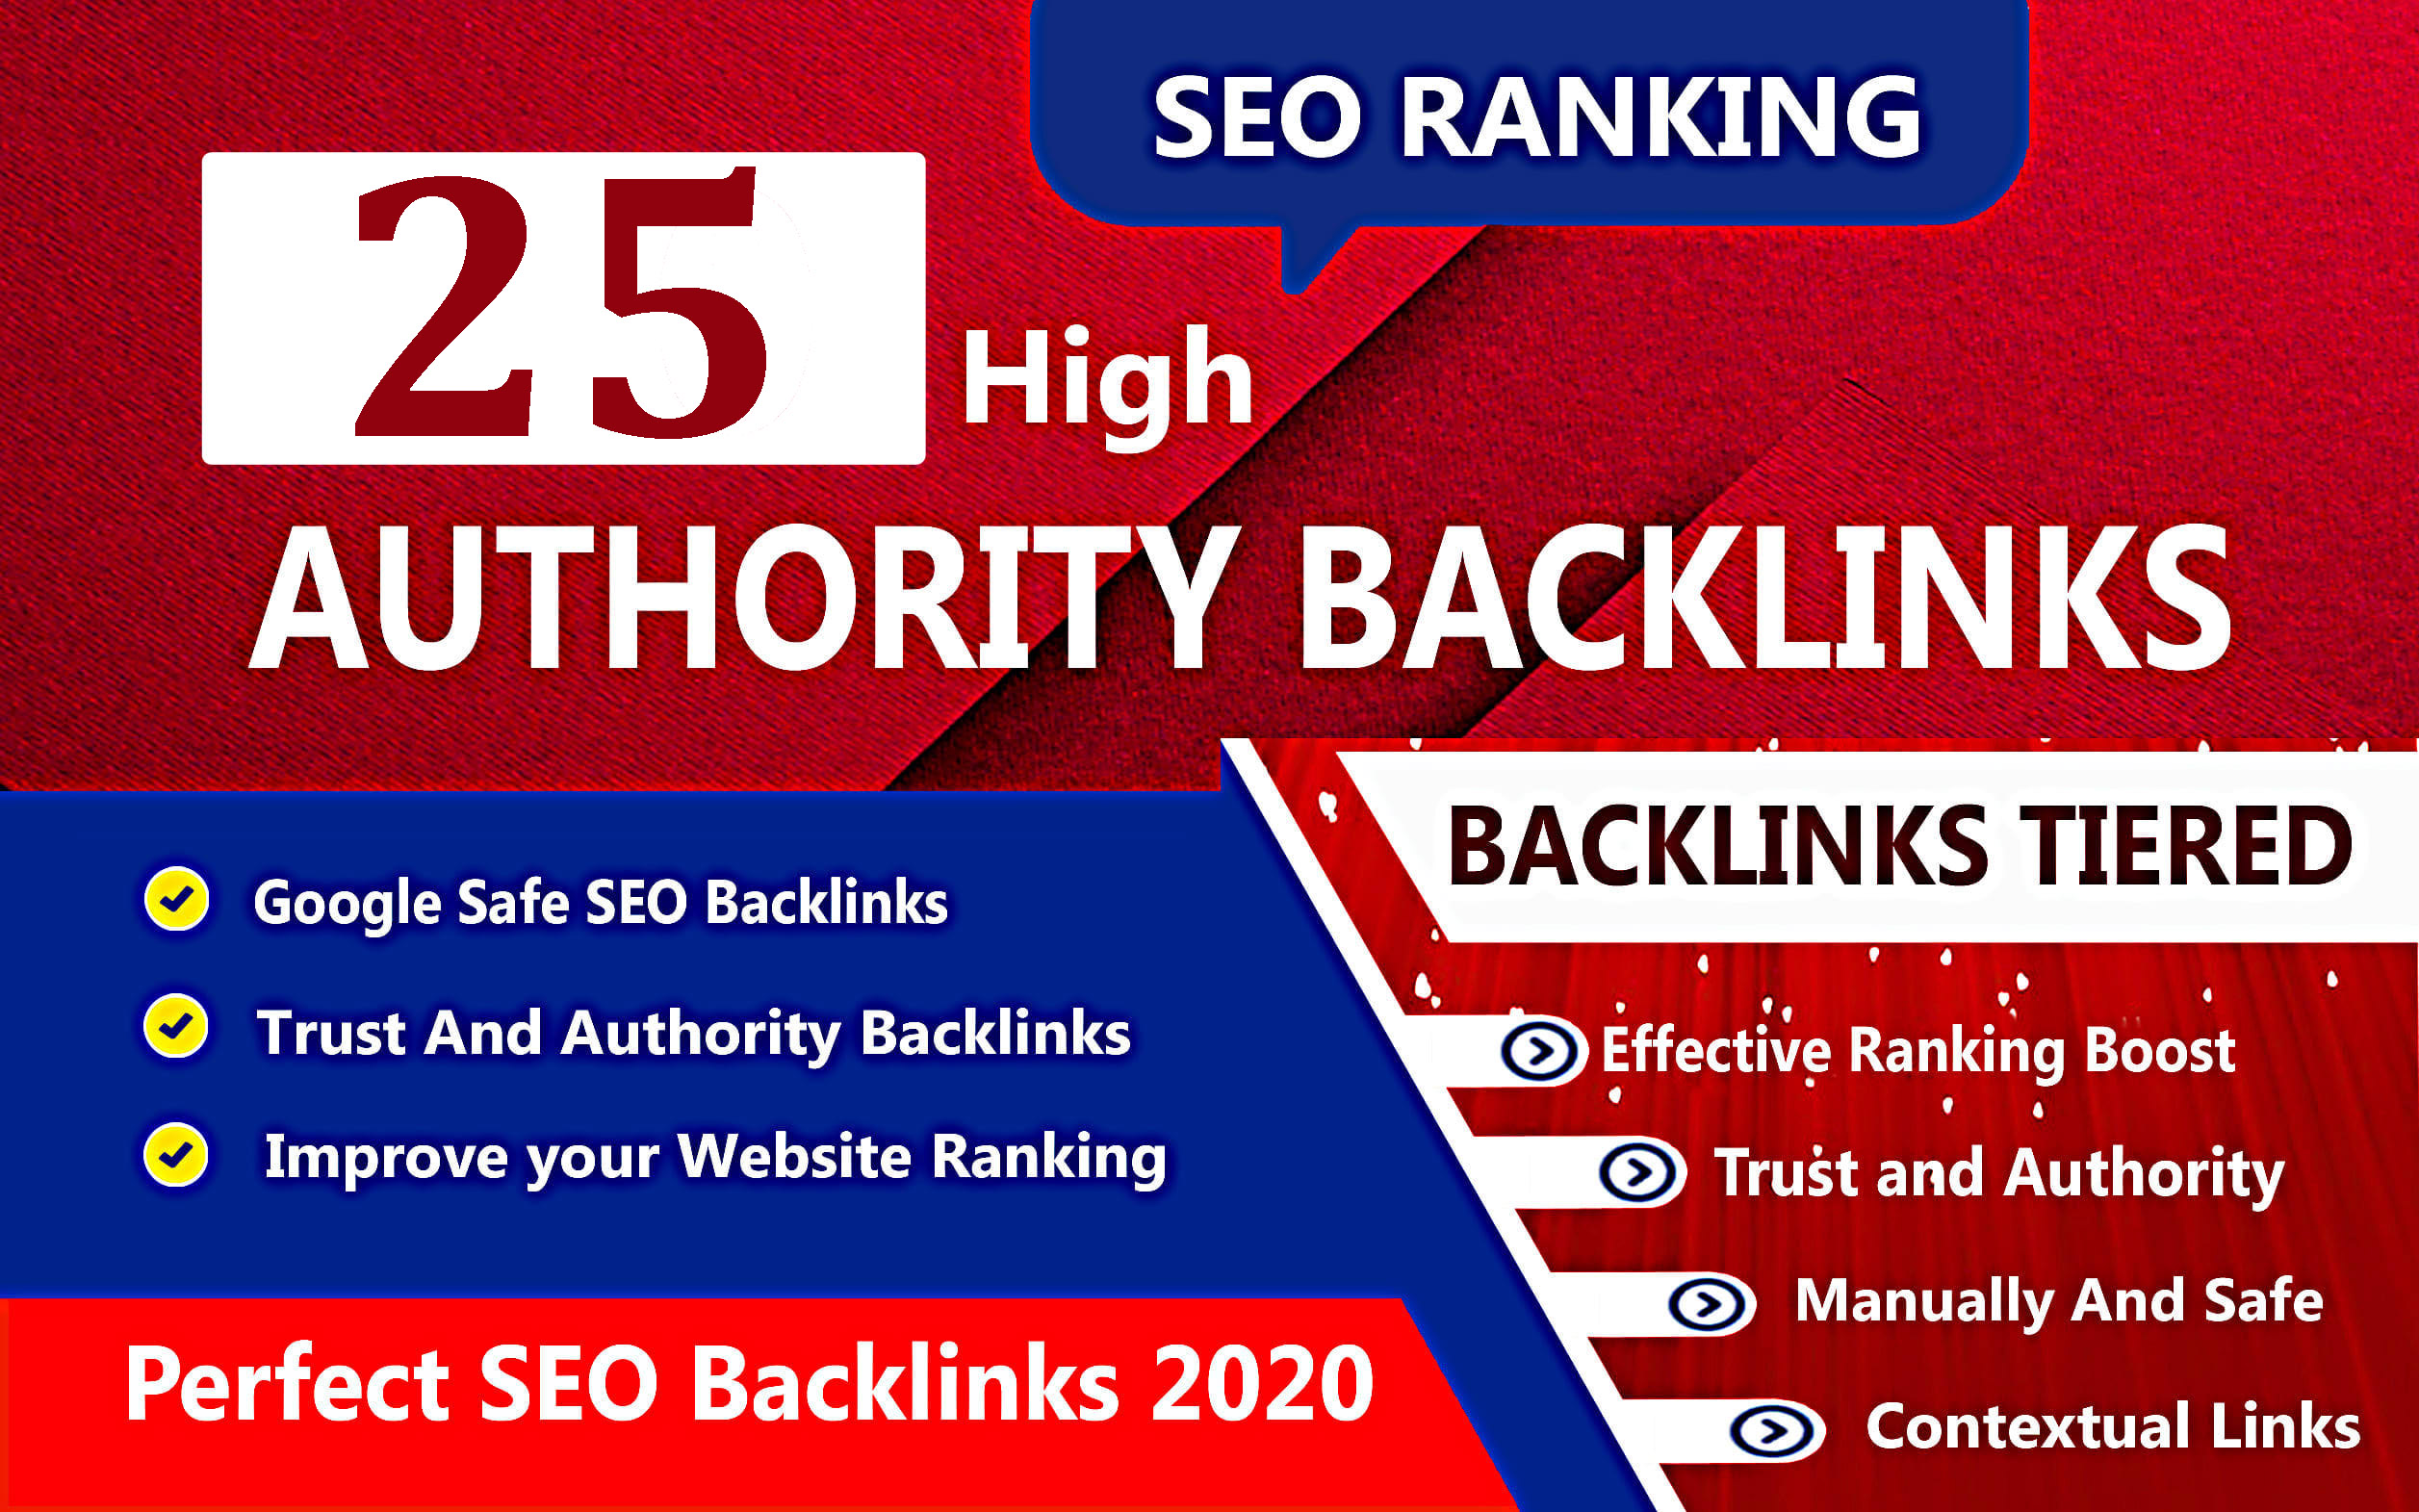 I will create 25 manual authority web 2.0 backlinks